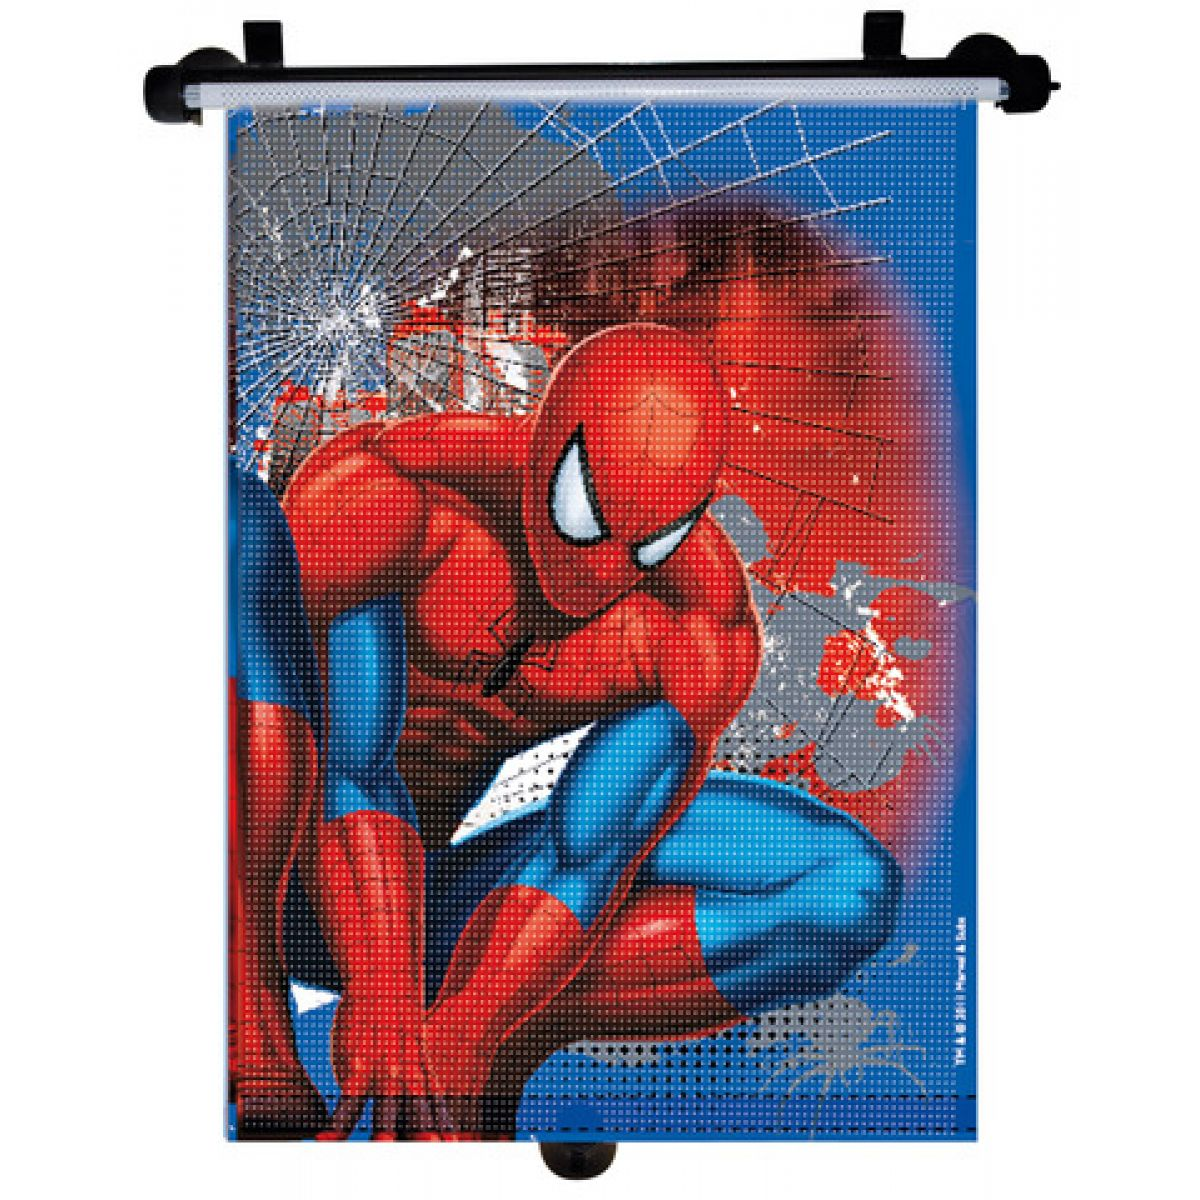 "Licence Only SMSAA110 - Roletka do auta ""Spiderman"" (1 ks) 41x49 cm"